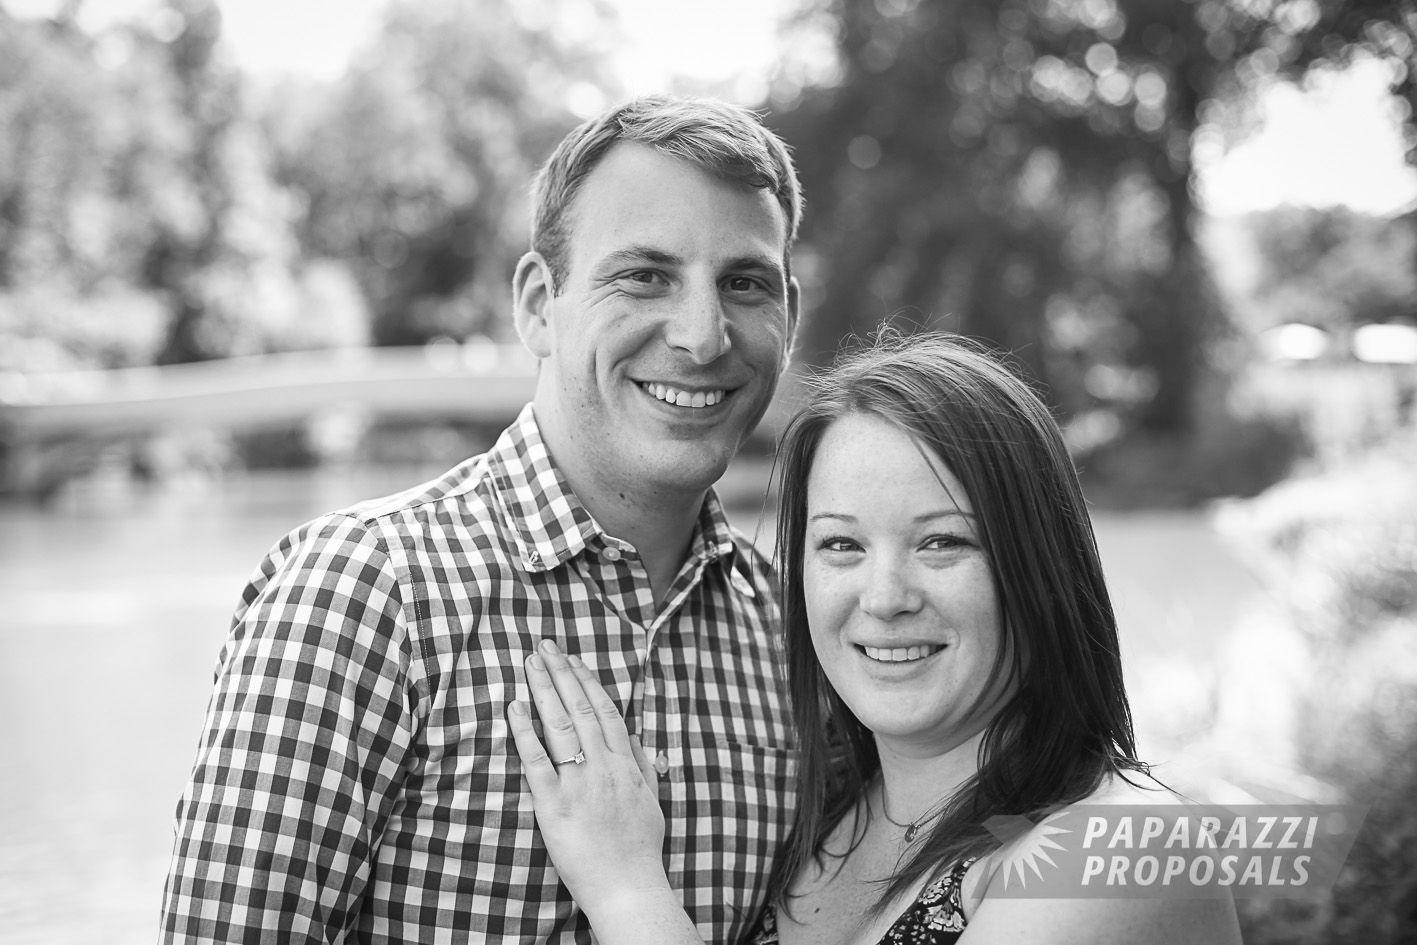 Nick And Elizabeths Bow Bridge Paparazzi Proposal In